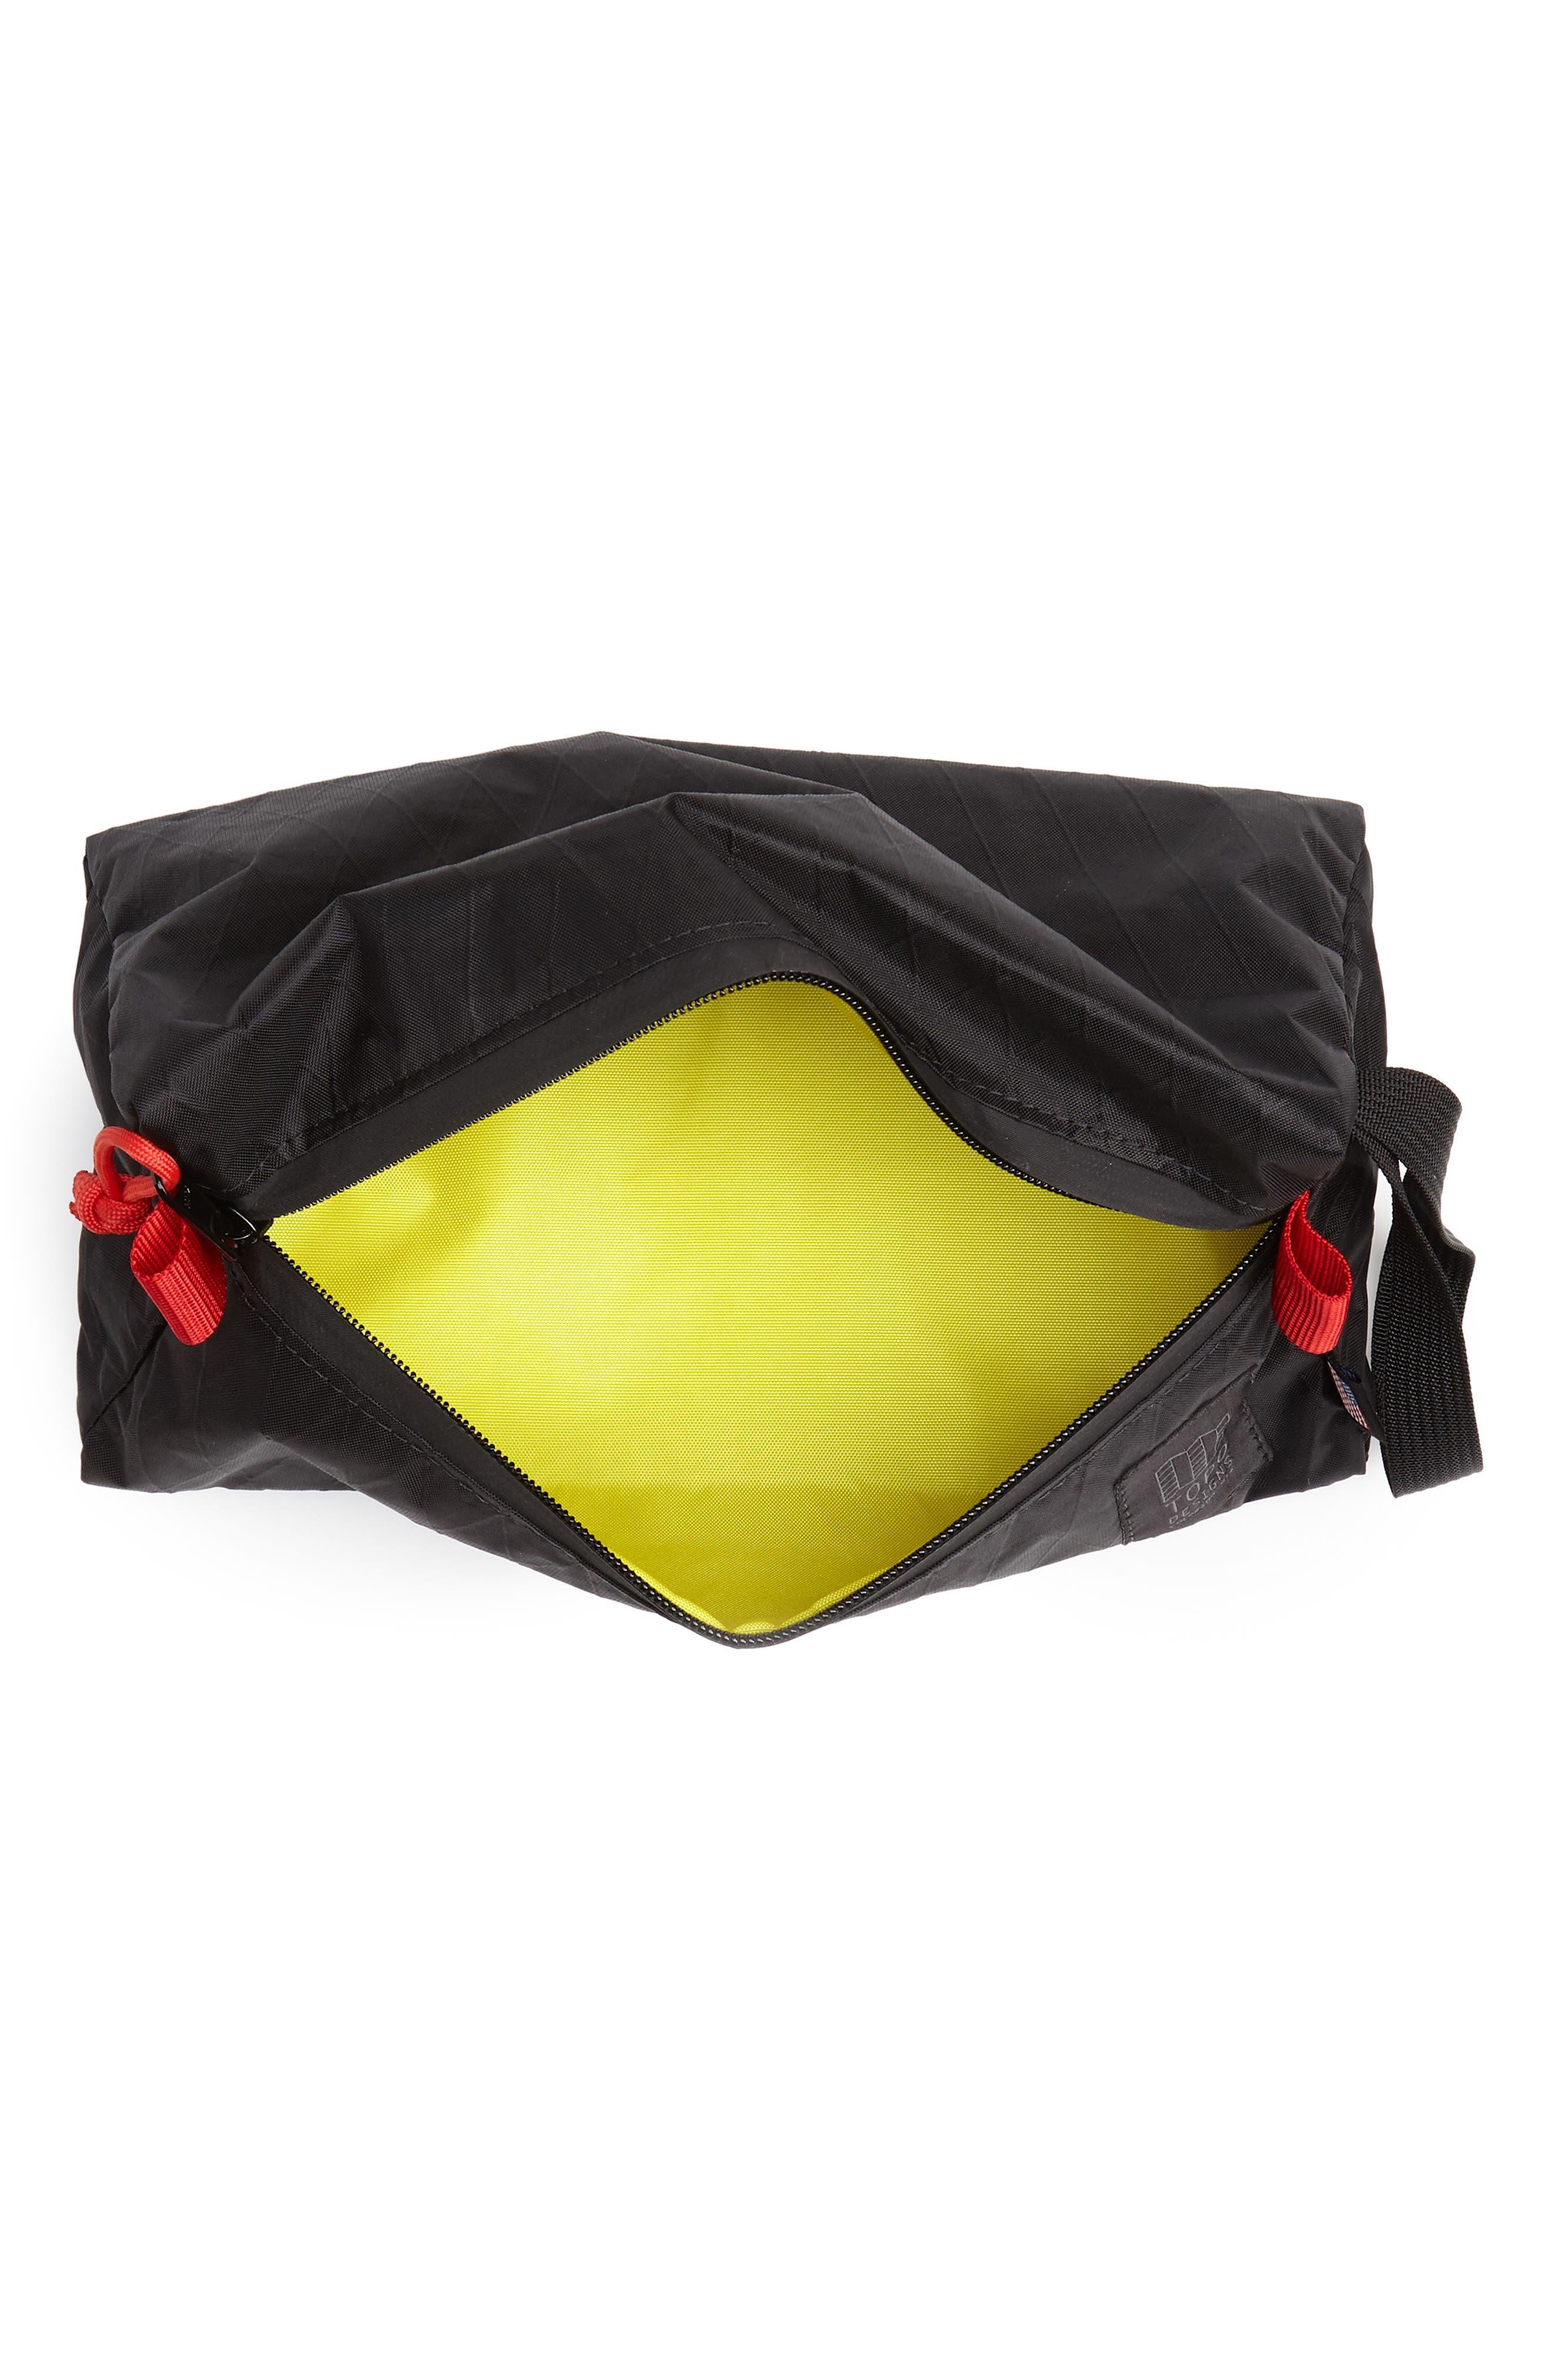 X-Pac Dopp Kit,                             Alternate thumbnail 3, color,                             X-PAC BLACK